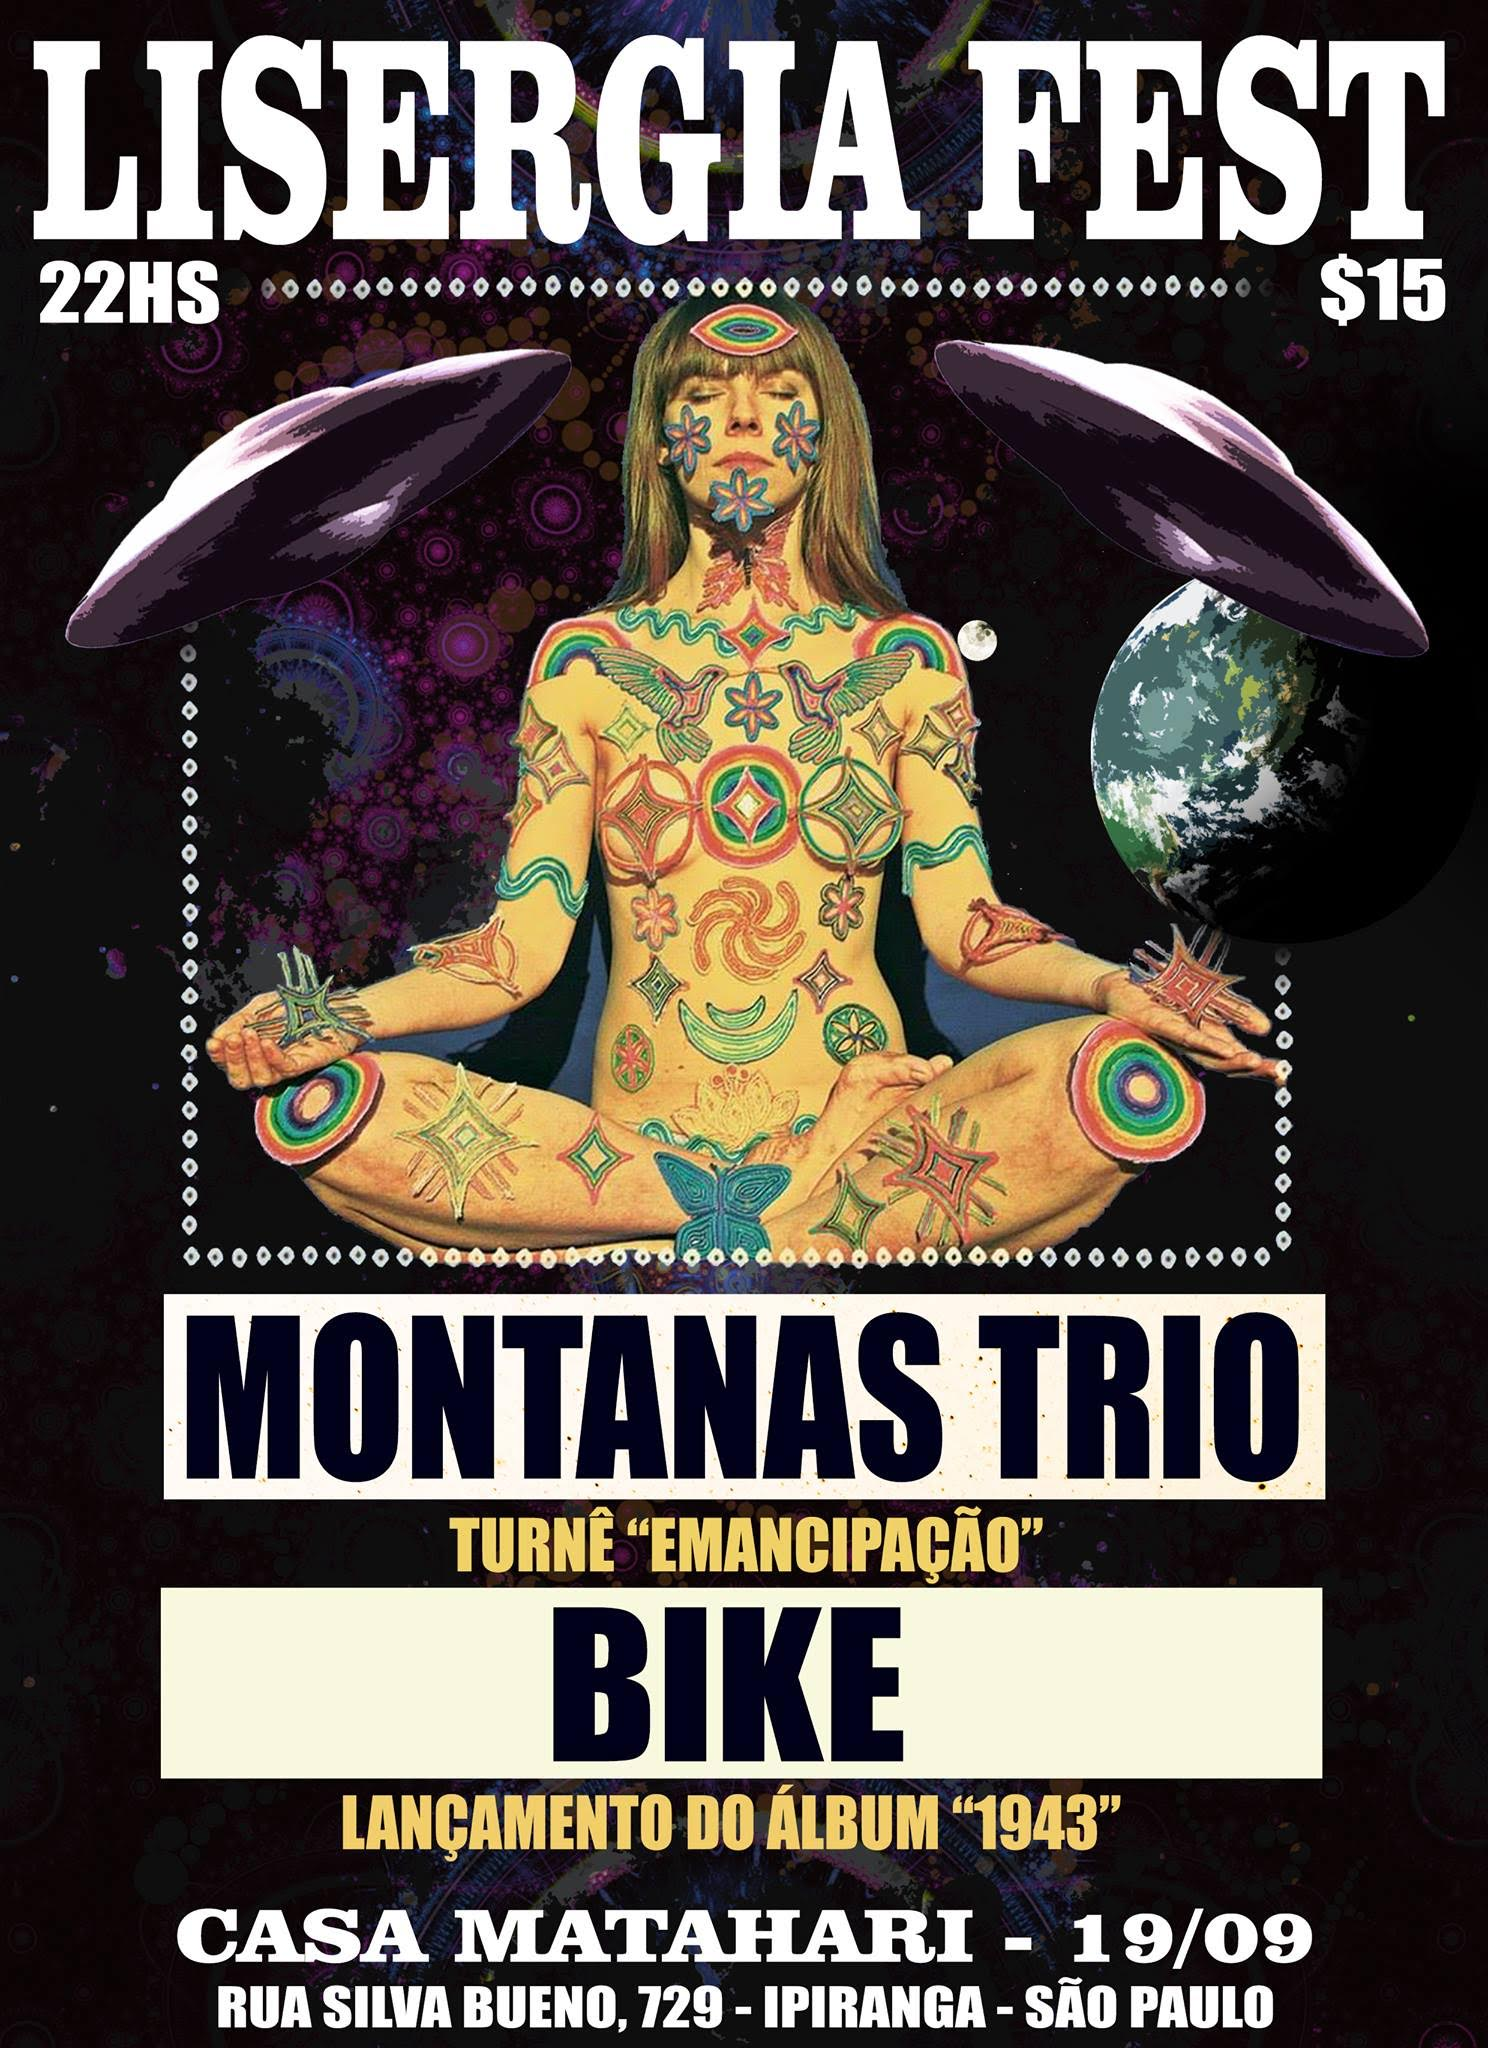 Bike_Lisergia Fest